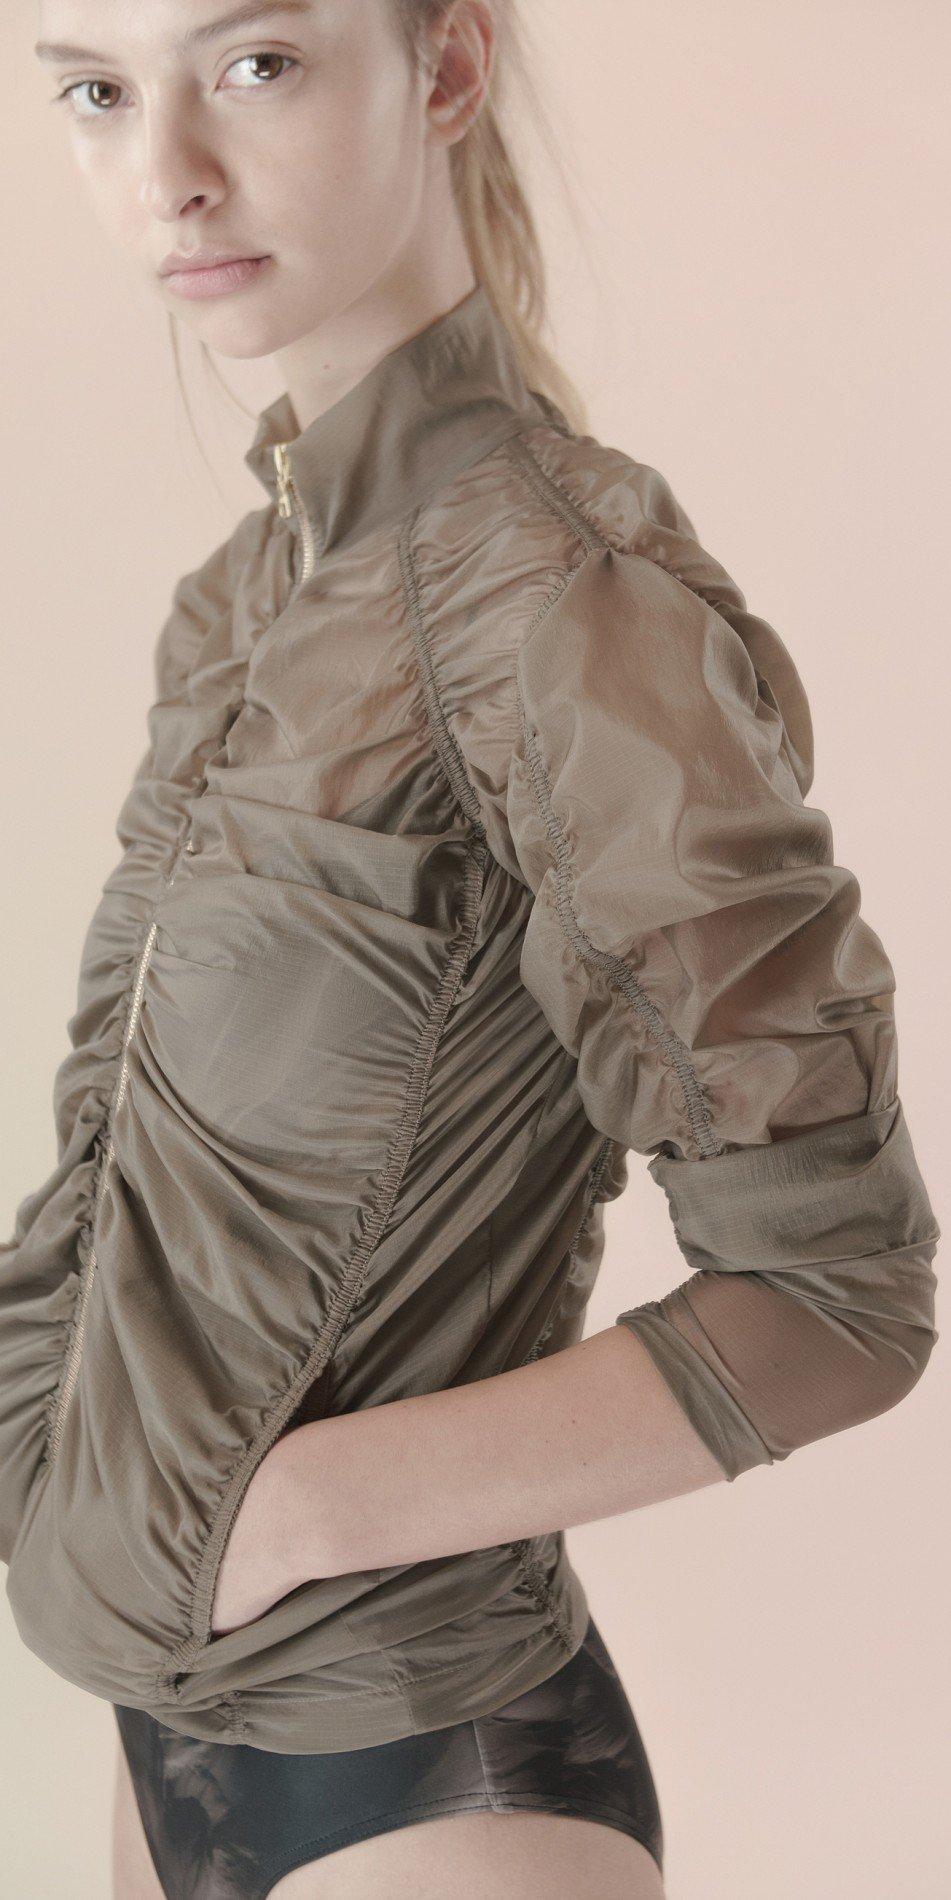 para cute khaki jacket 5 r